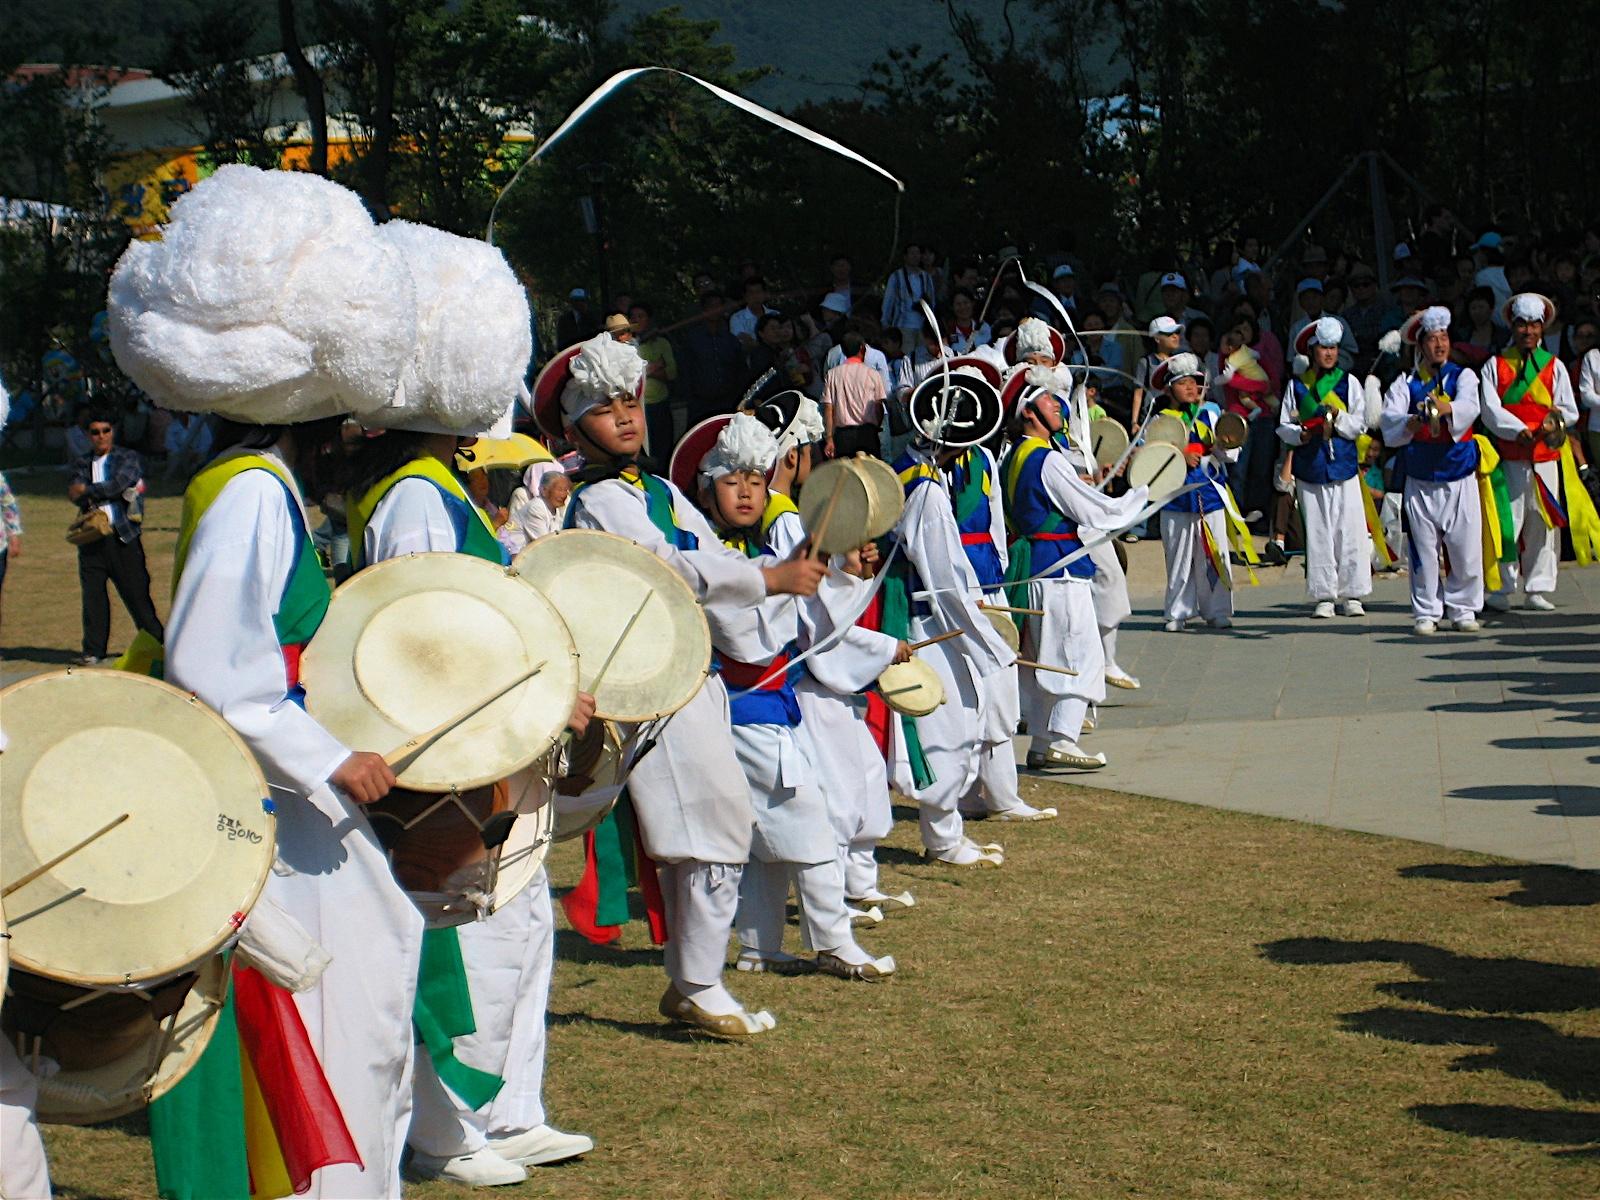 http://upload.wikimedia.org/wikipedia/commons/6/65/Korea-2007_Gyeongju_World_Culture_Expo-Nongak-01.jpg